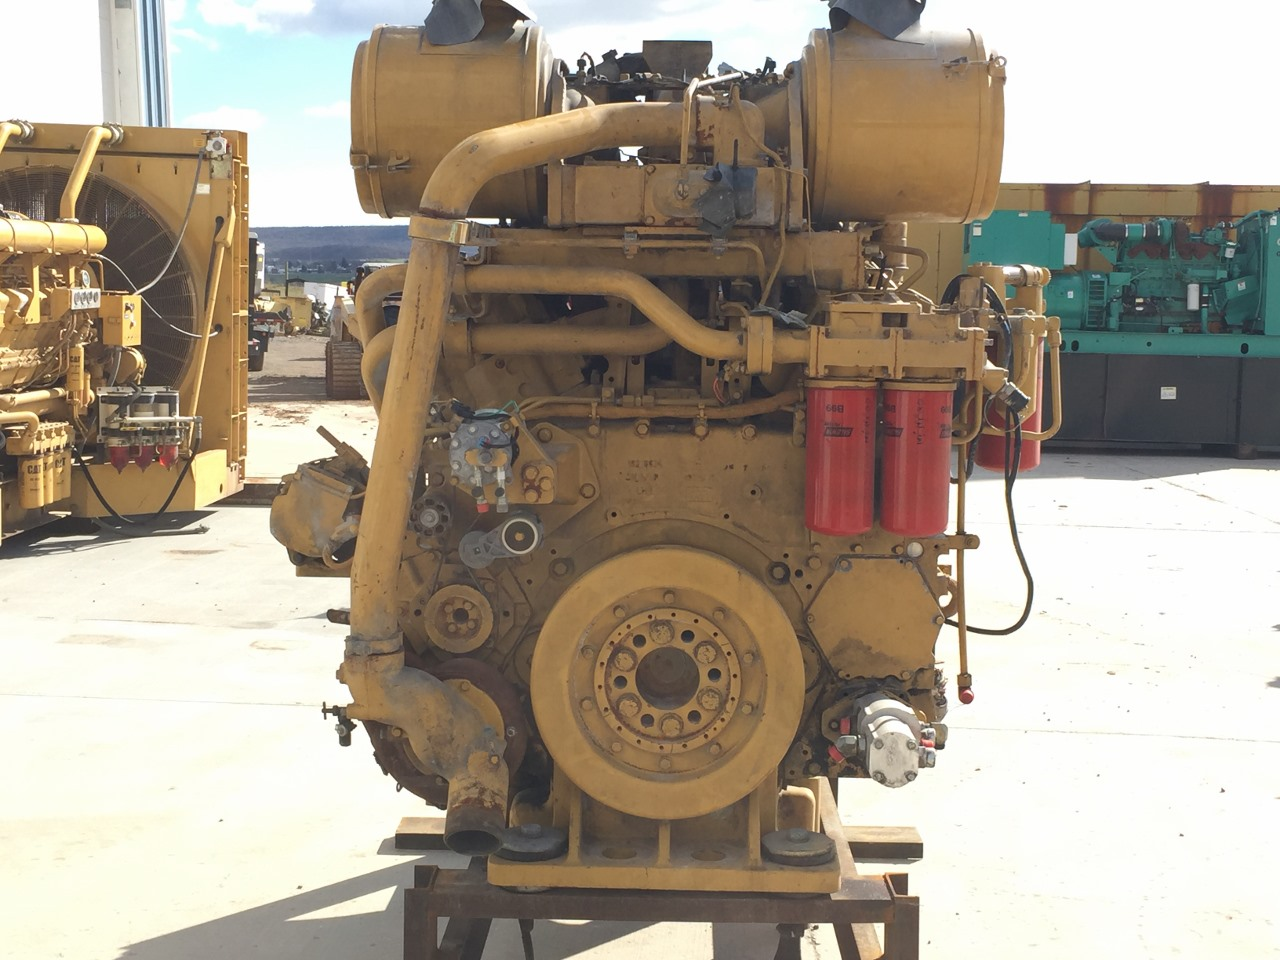 3508B Caterpillar Engine, Takeout of 992G Wheel Loader